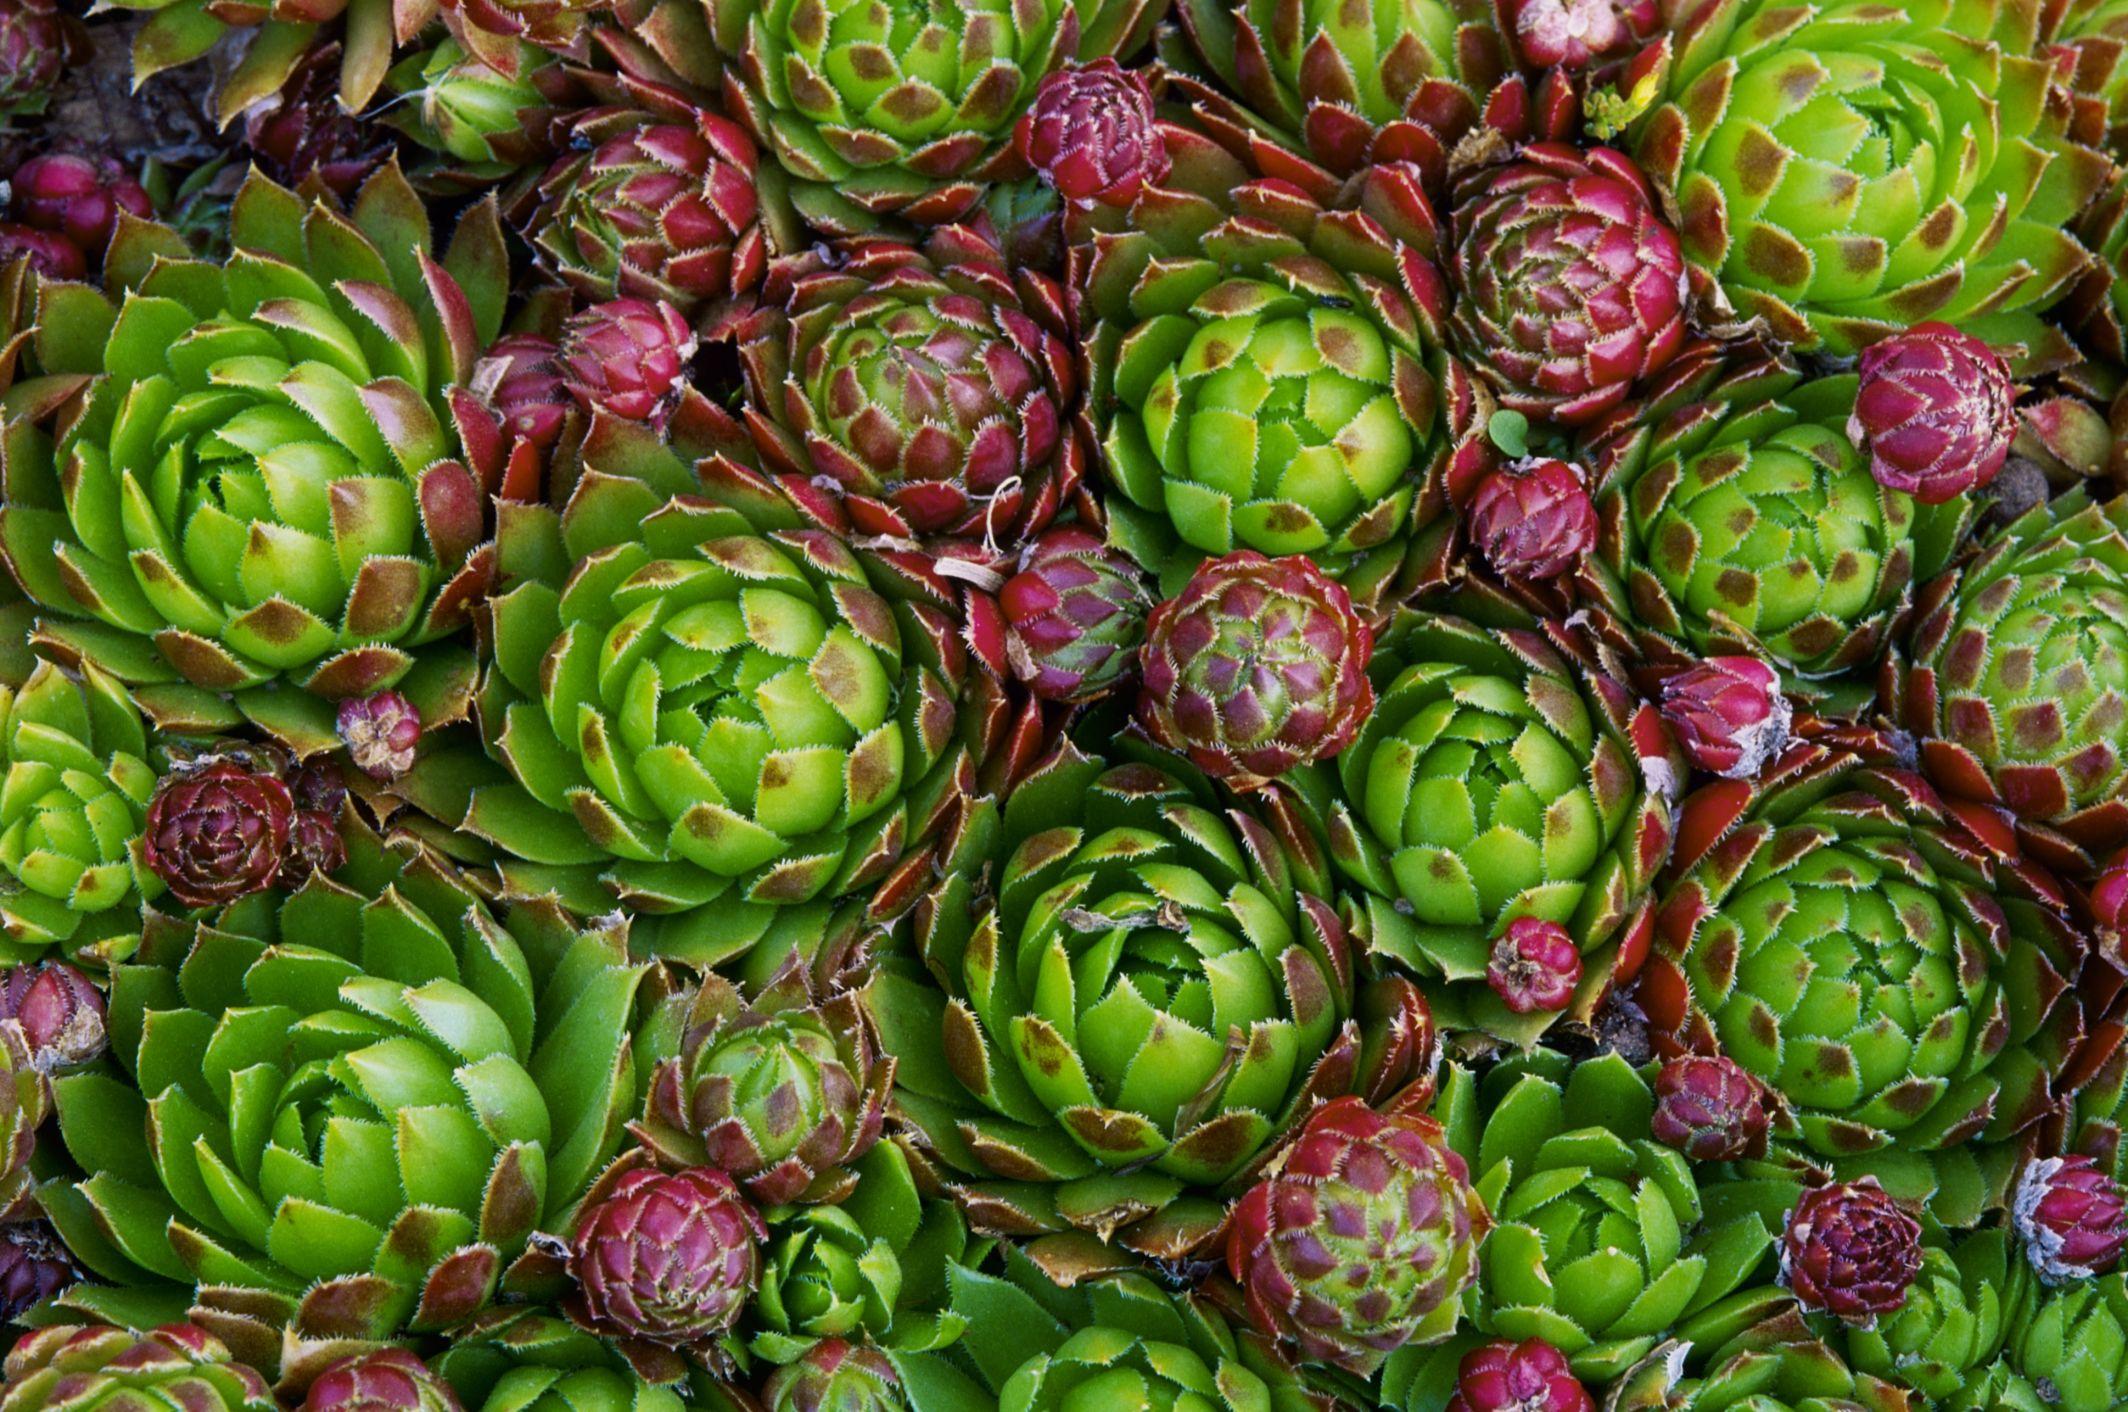 8 Funny Plant Names - Plants With Odd Nicknames